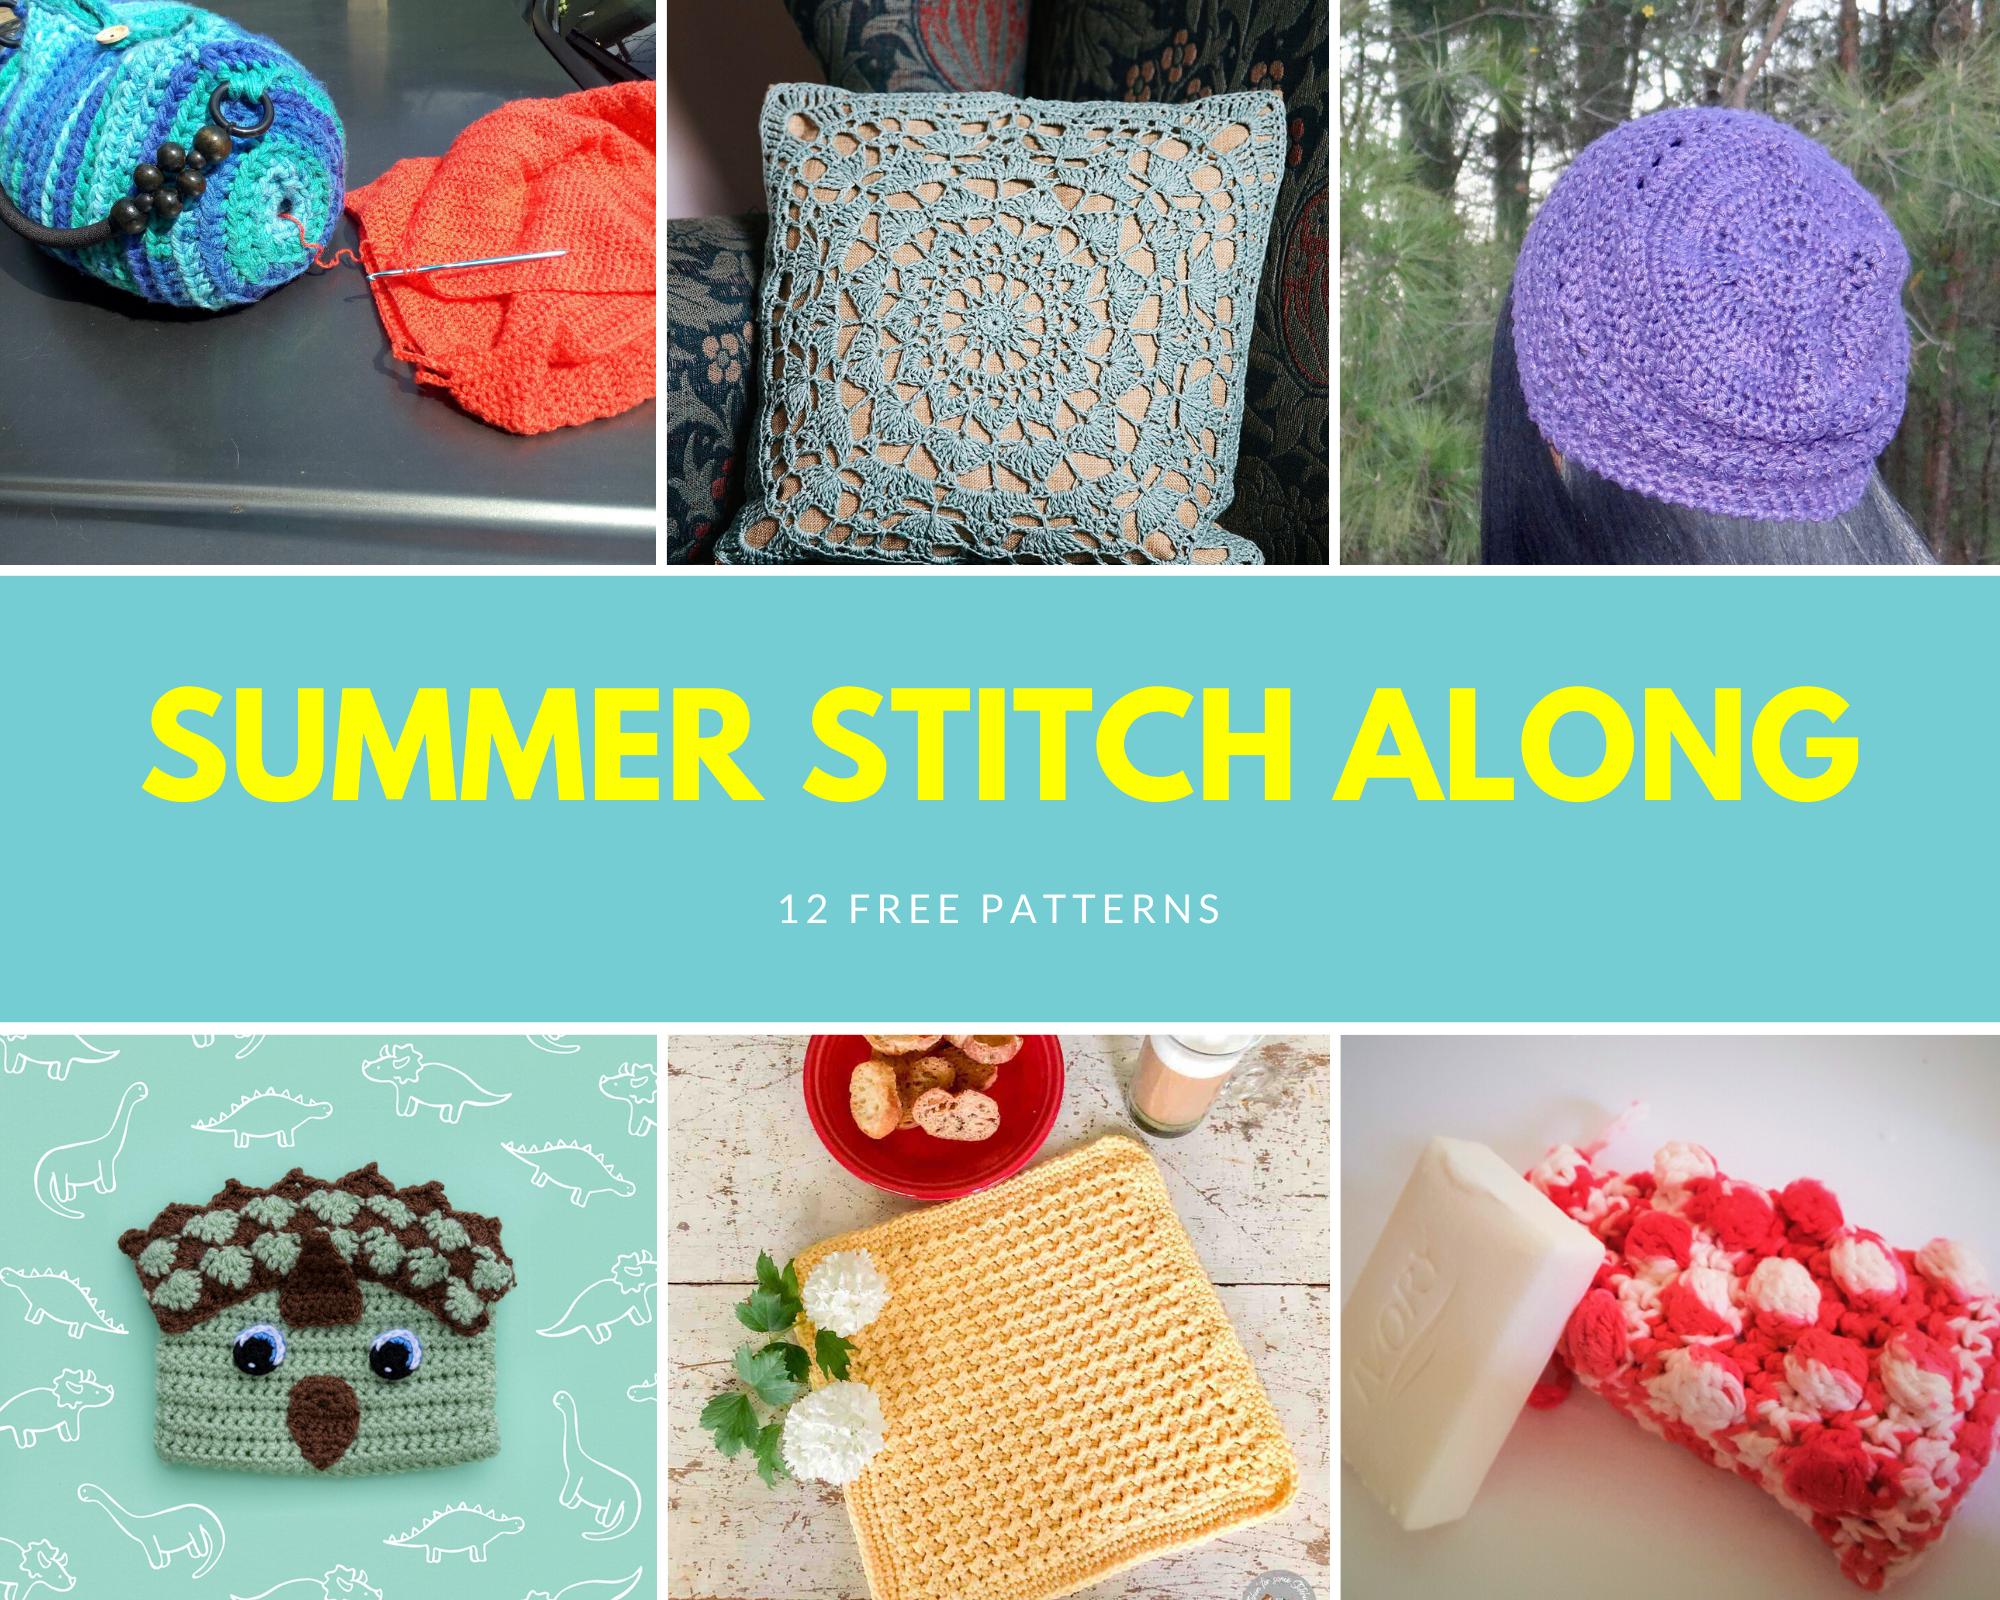 Summer Stitch Along Week 4